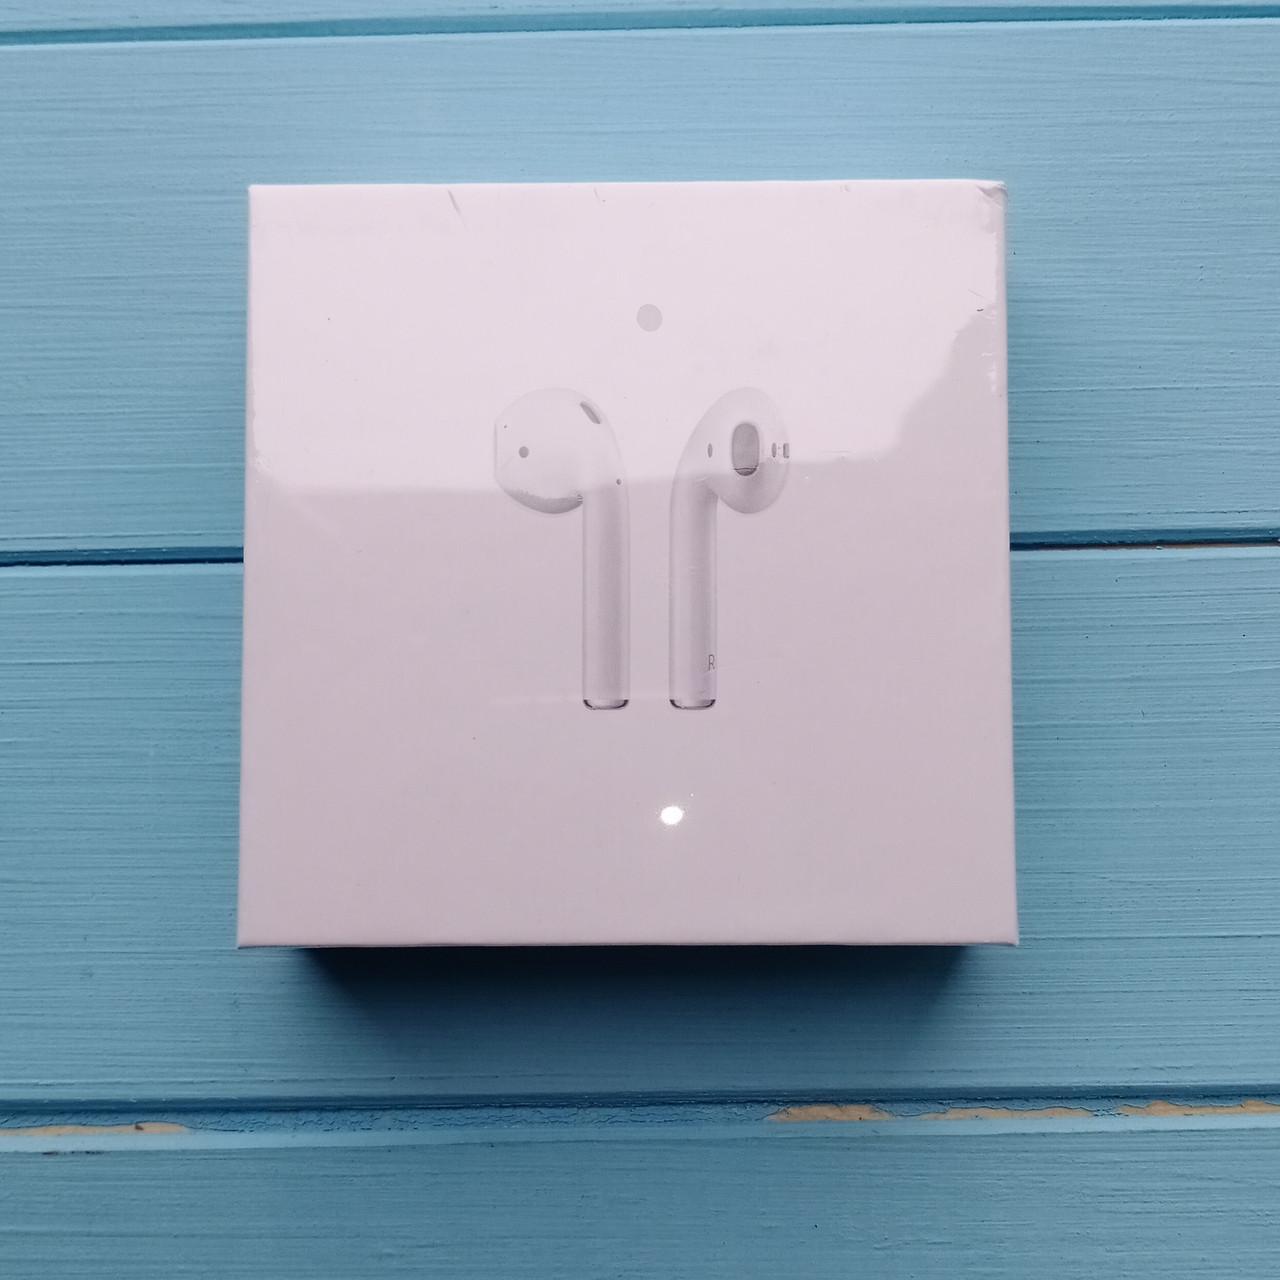 Наушники Apple AirPods 2019 (2 поколения) with Charging Case